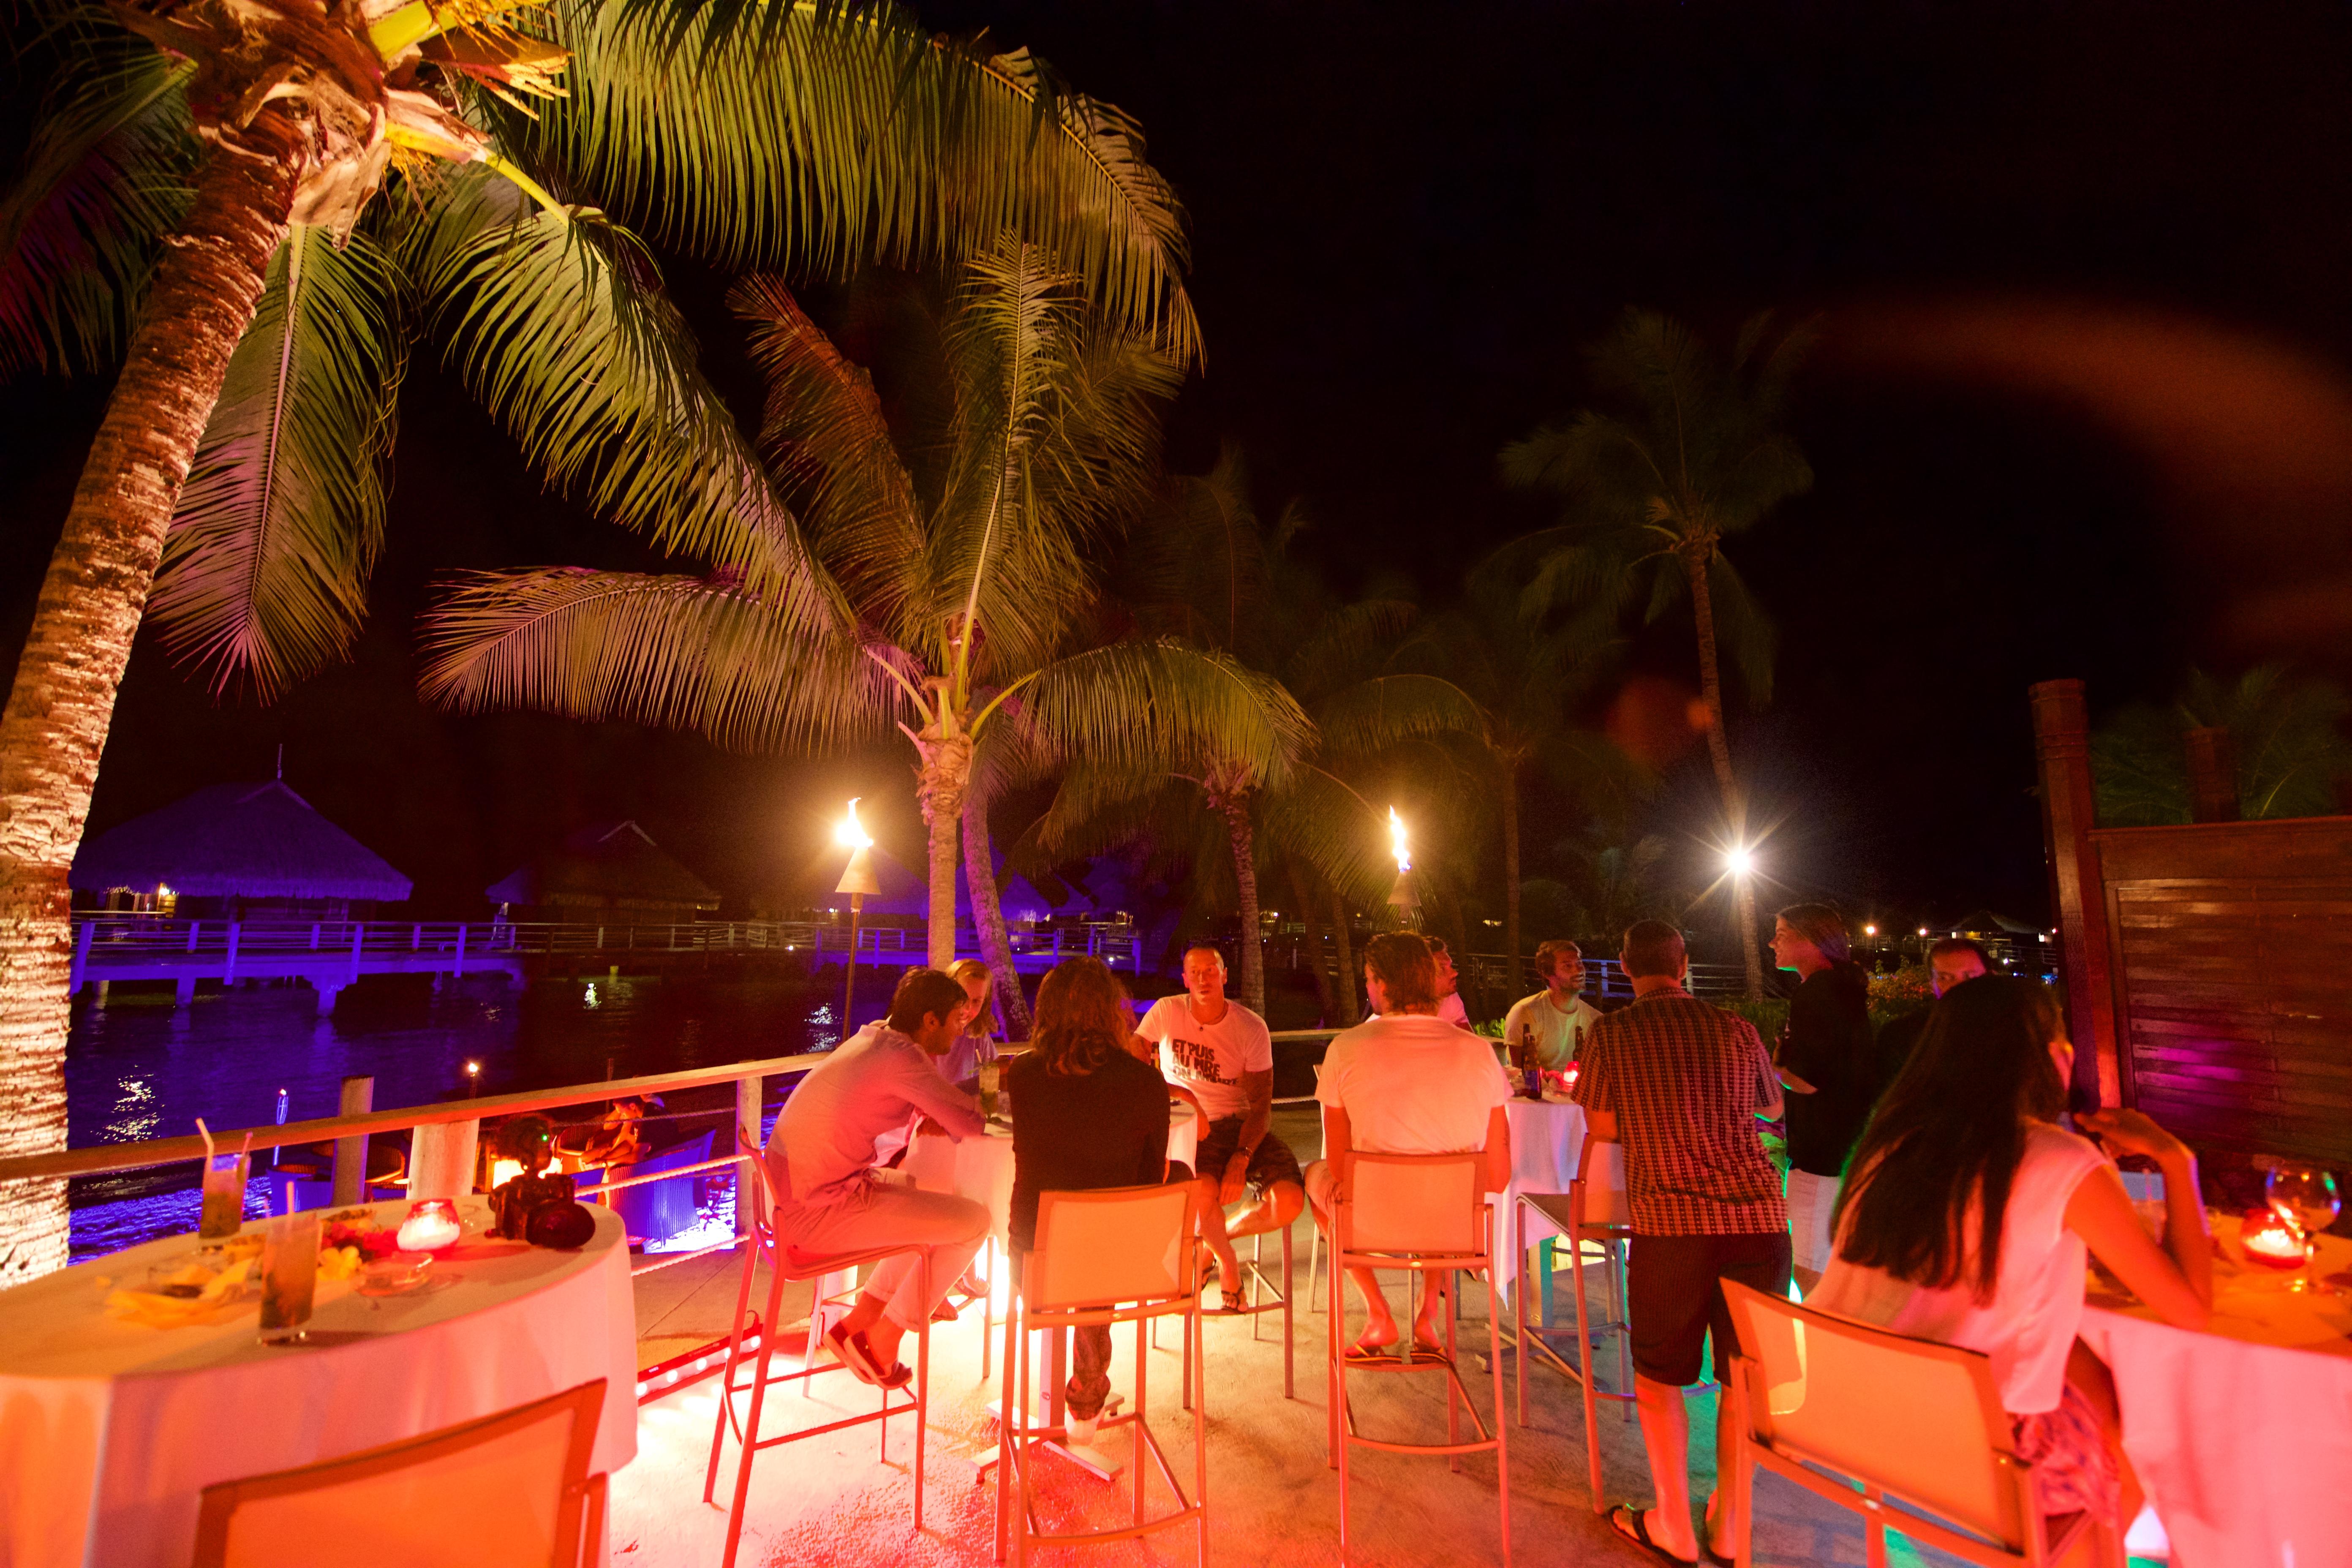 https://tahititourisme.jp/wp-content/uploads/2018/03/RESTAURATION-Matahiehani-Lounge-Bar-featured_image-Tim_McKenna.jpg